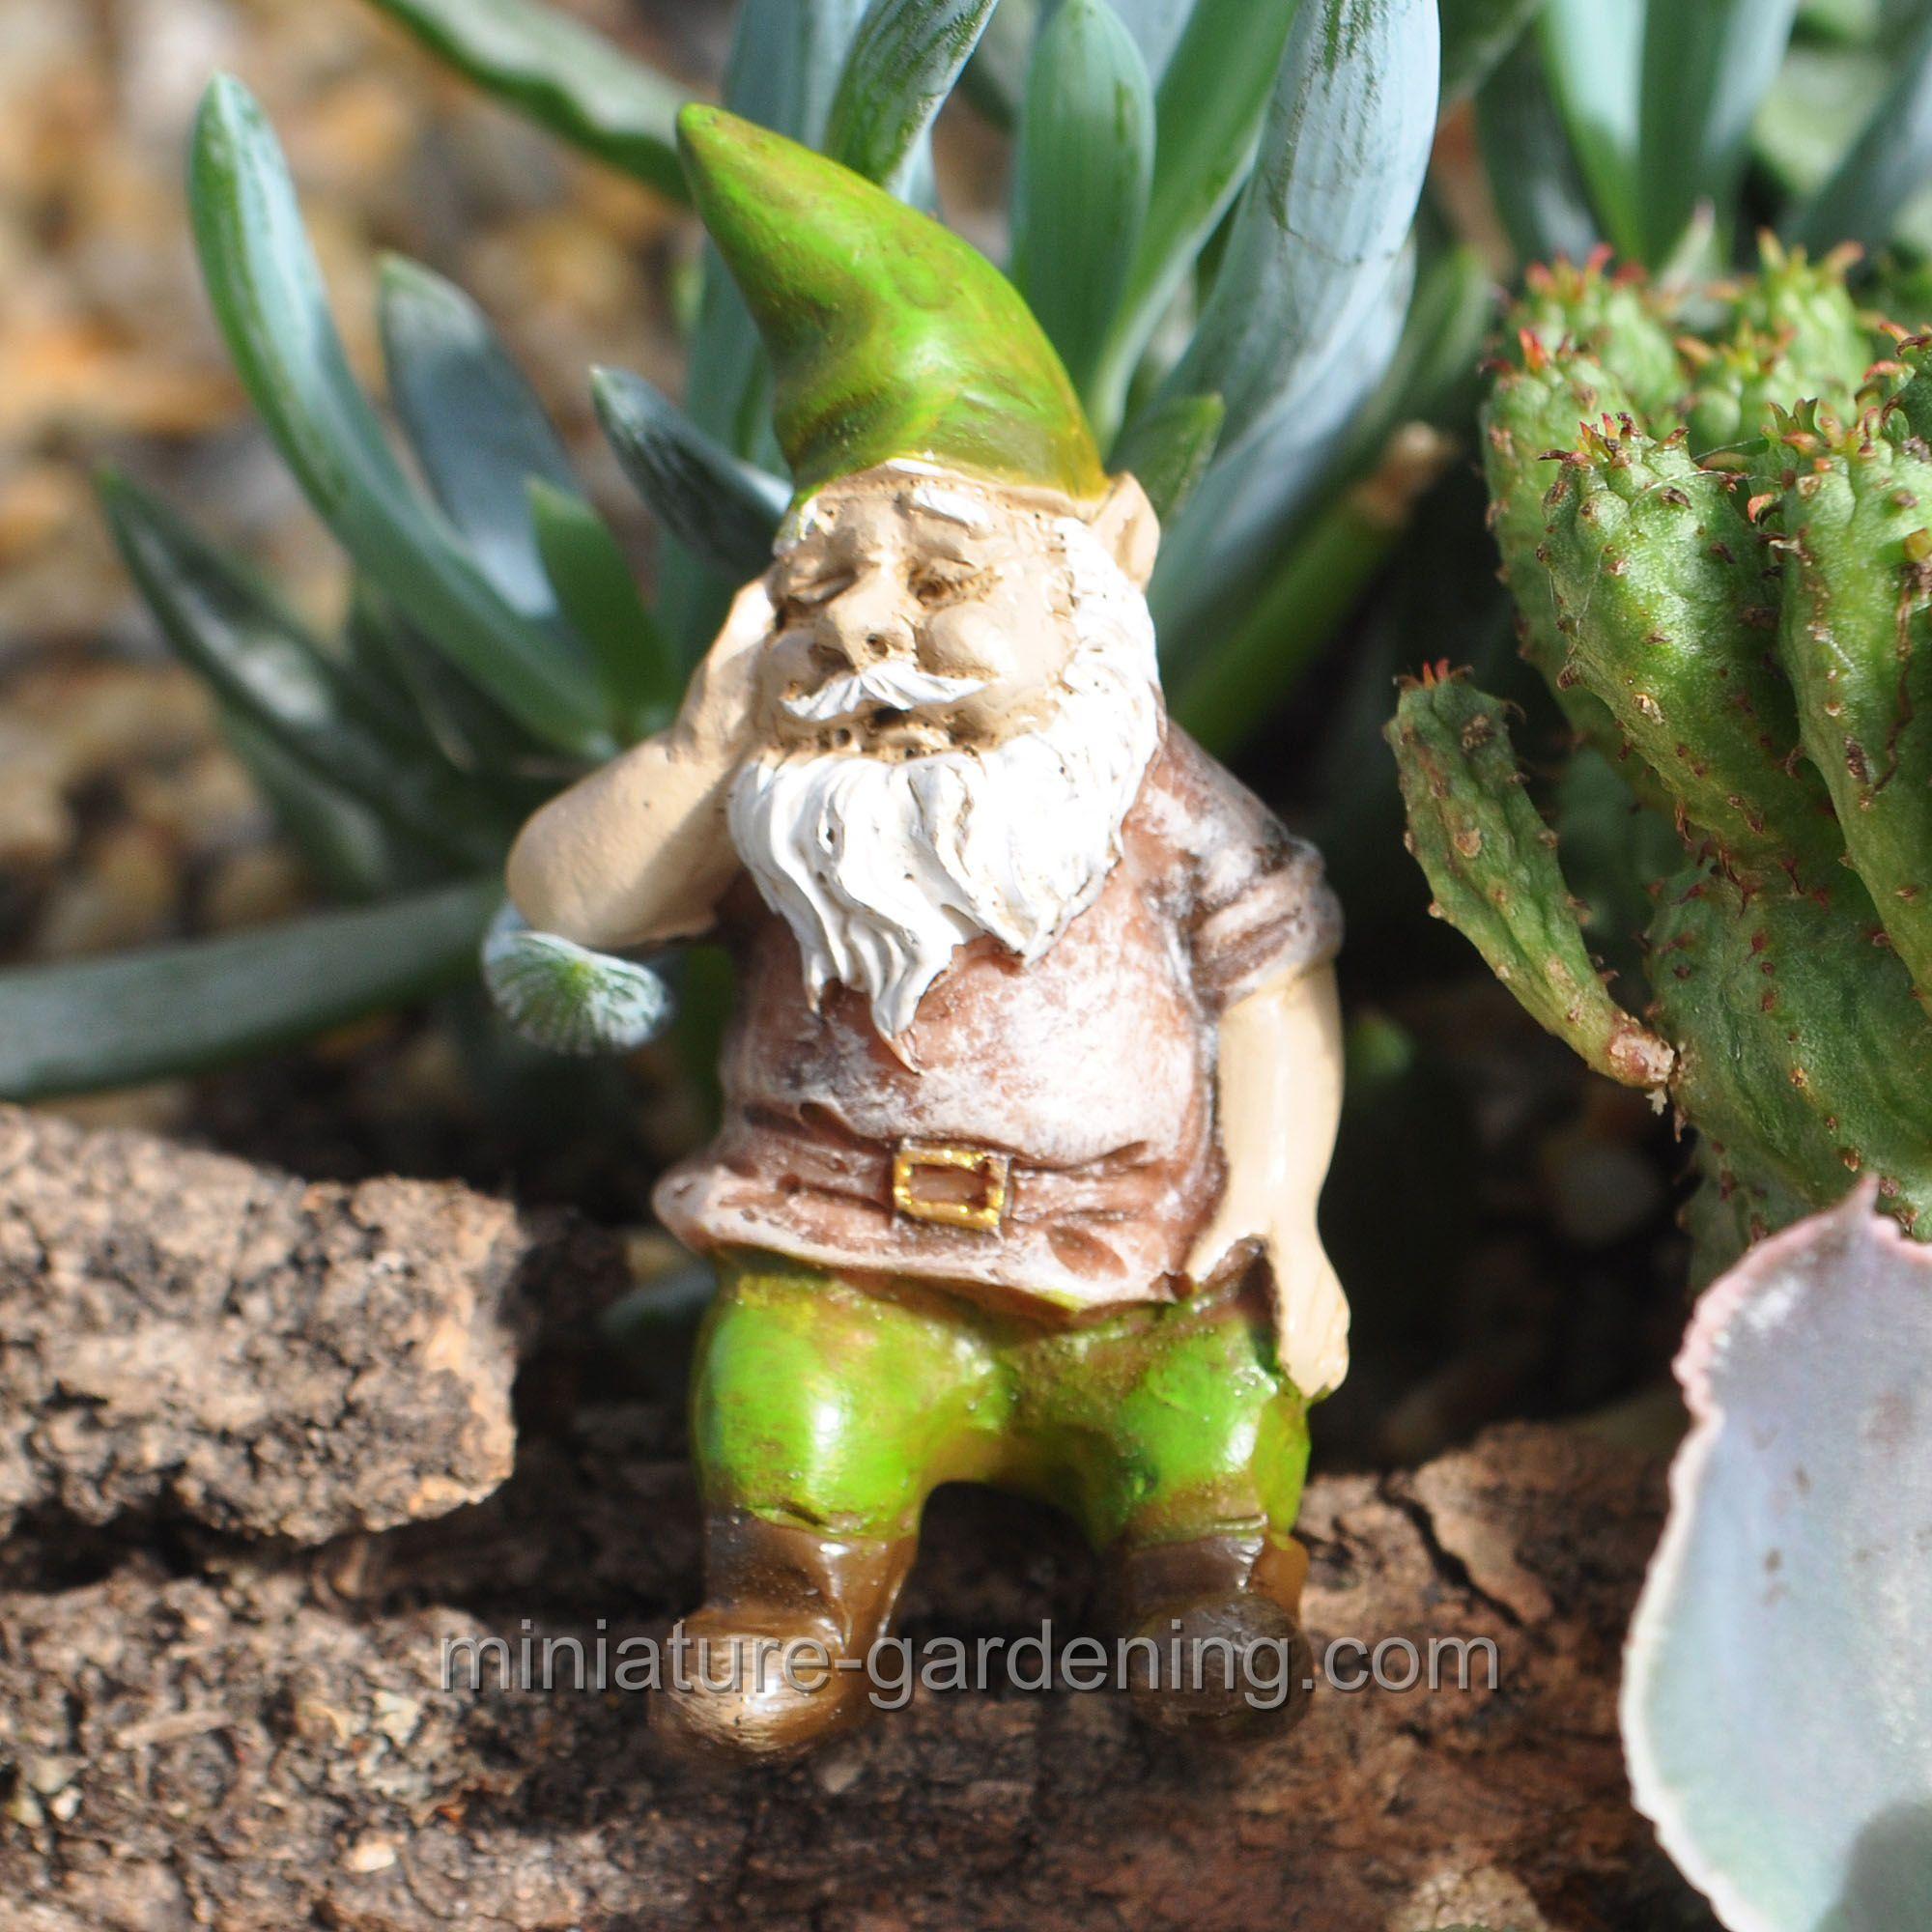 Gnome Garden: Iggy The Gnome #fairy-gardening > $4